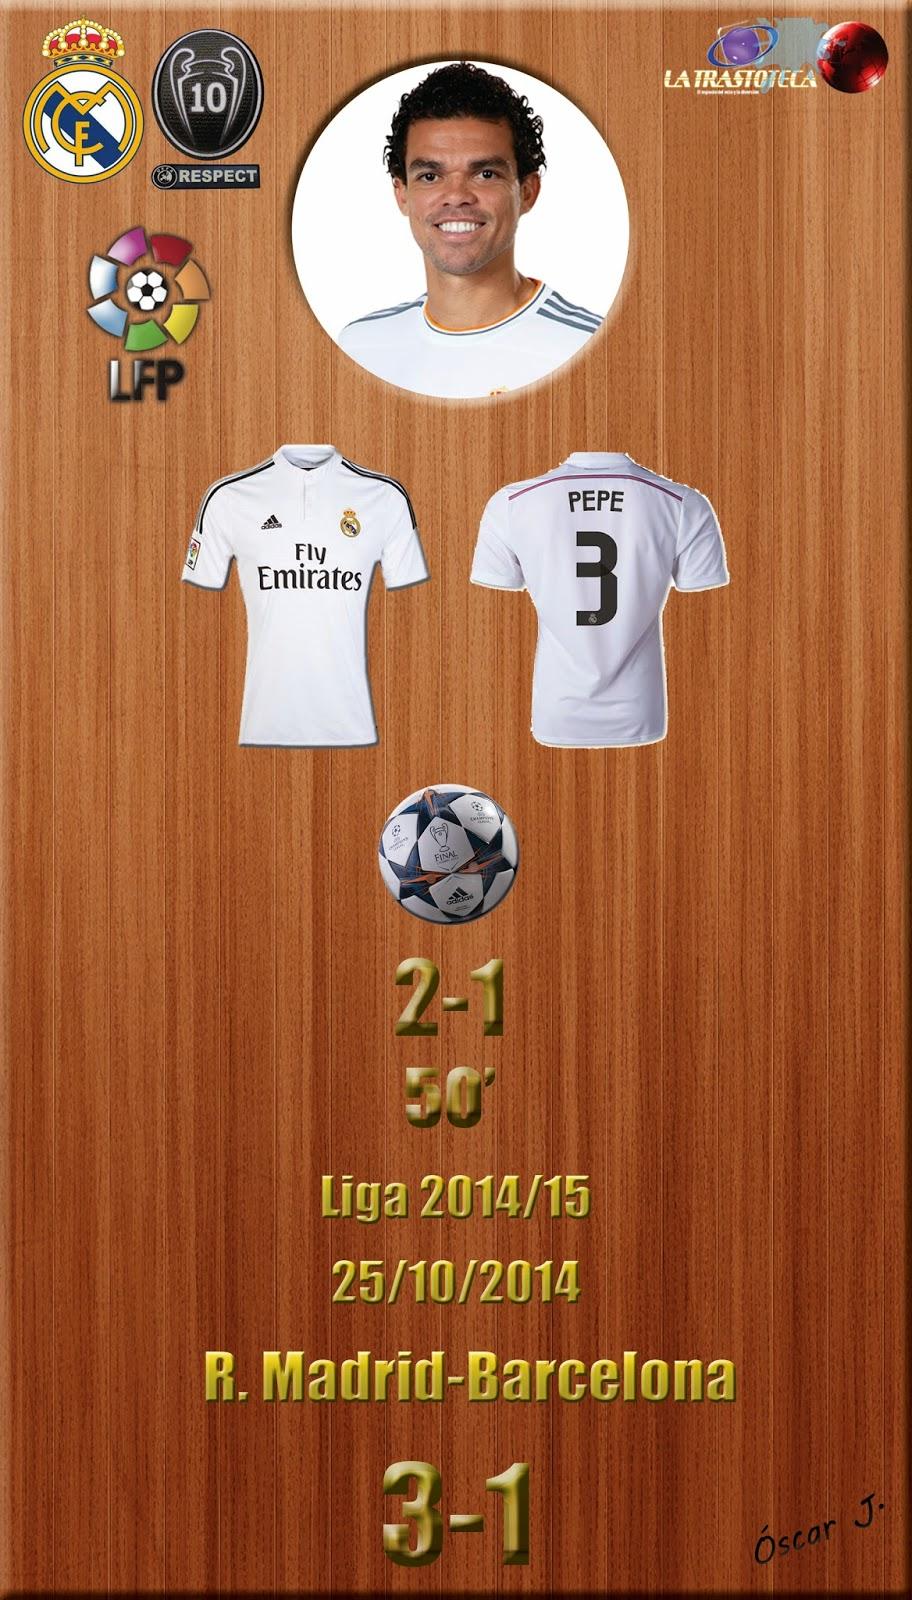 Pepe - (2-1) - Real Madrid 3-1 Barcelona - Liga 2014/15 - (25/10/2014)